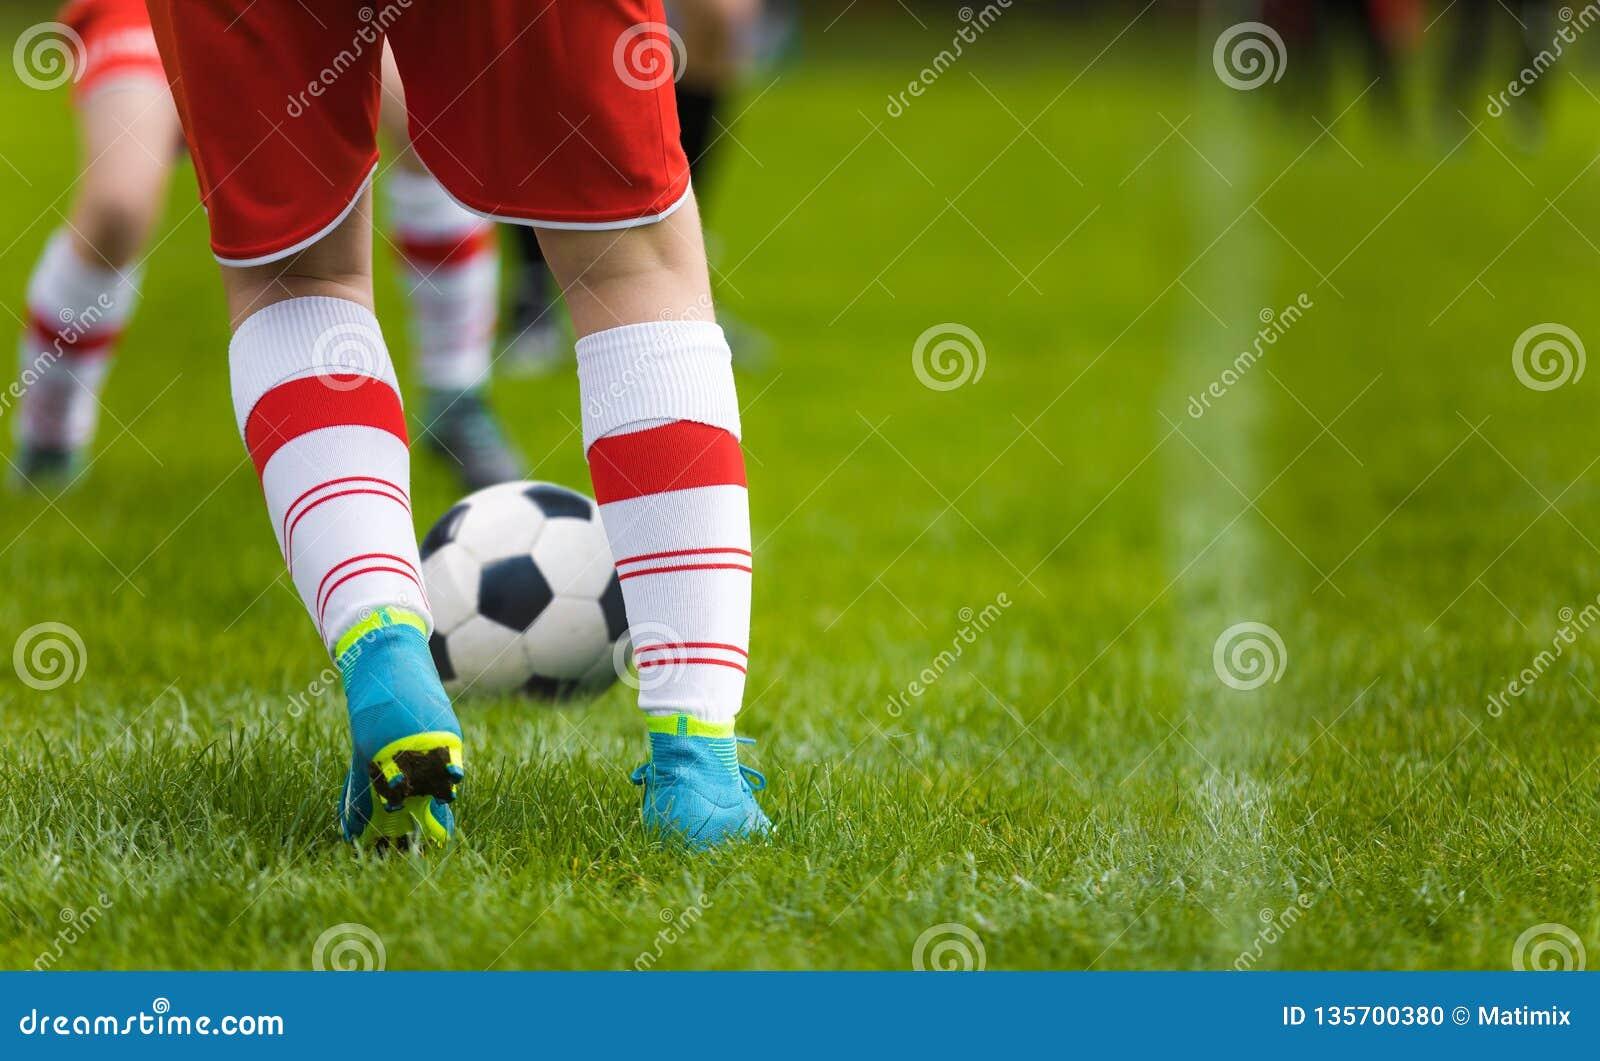 9de182f77fe Soccer Socks Stock Images - Download 1